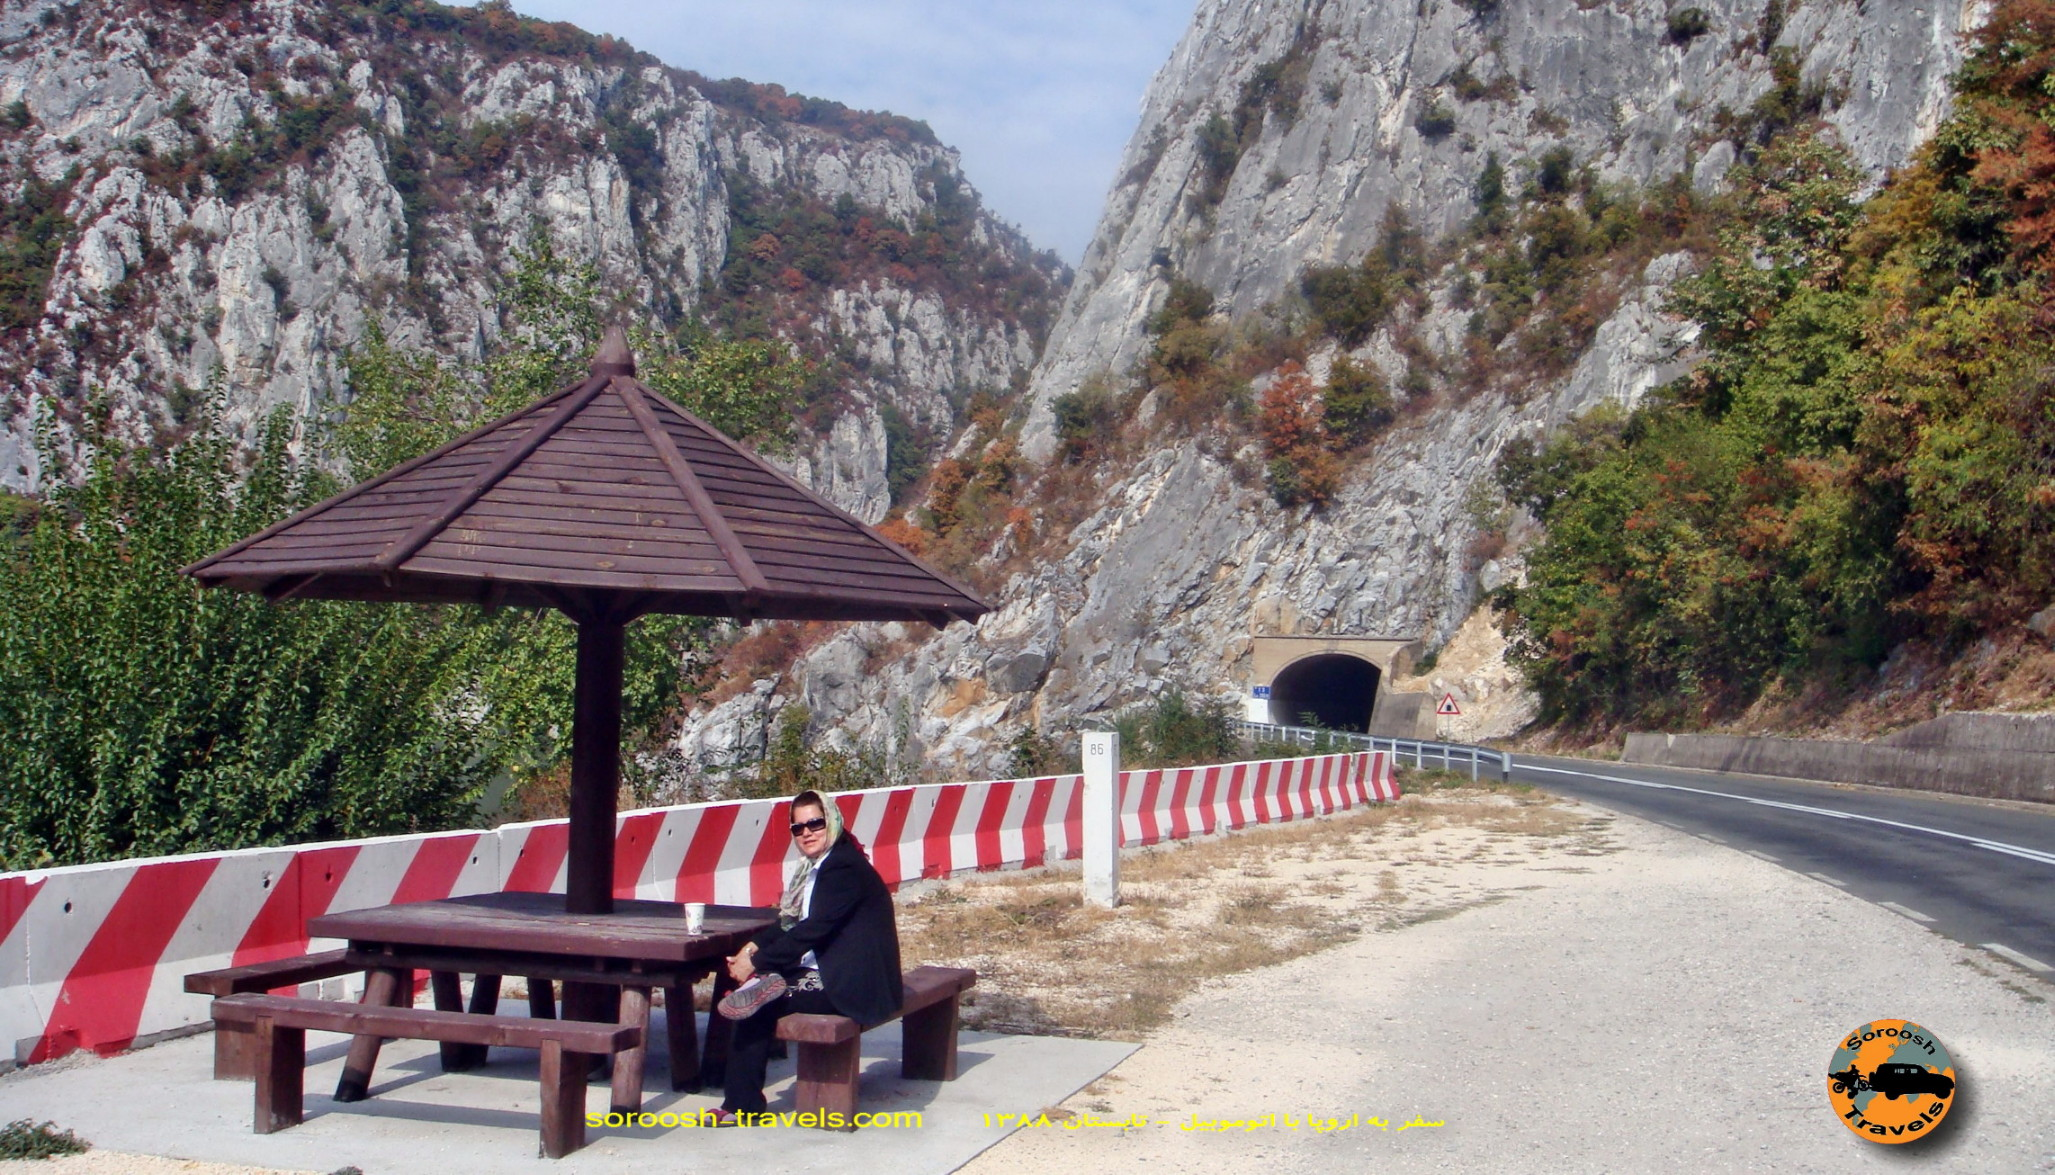 07-mehr-1388-29-september-2009-banatskapalanka-in-serbia-to-sofia-in-bulgaria-29